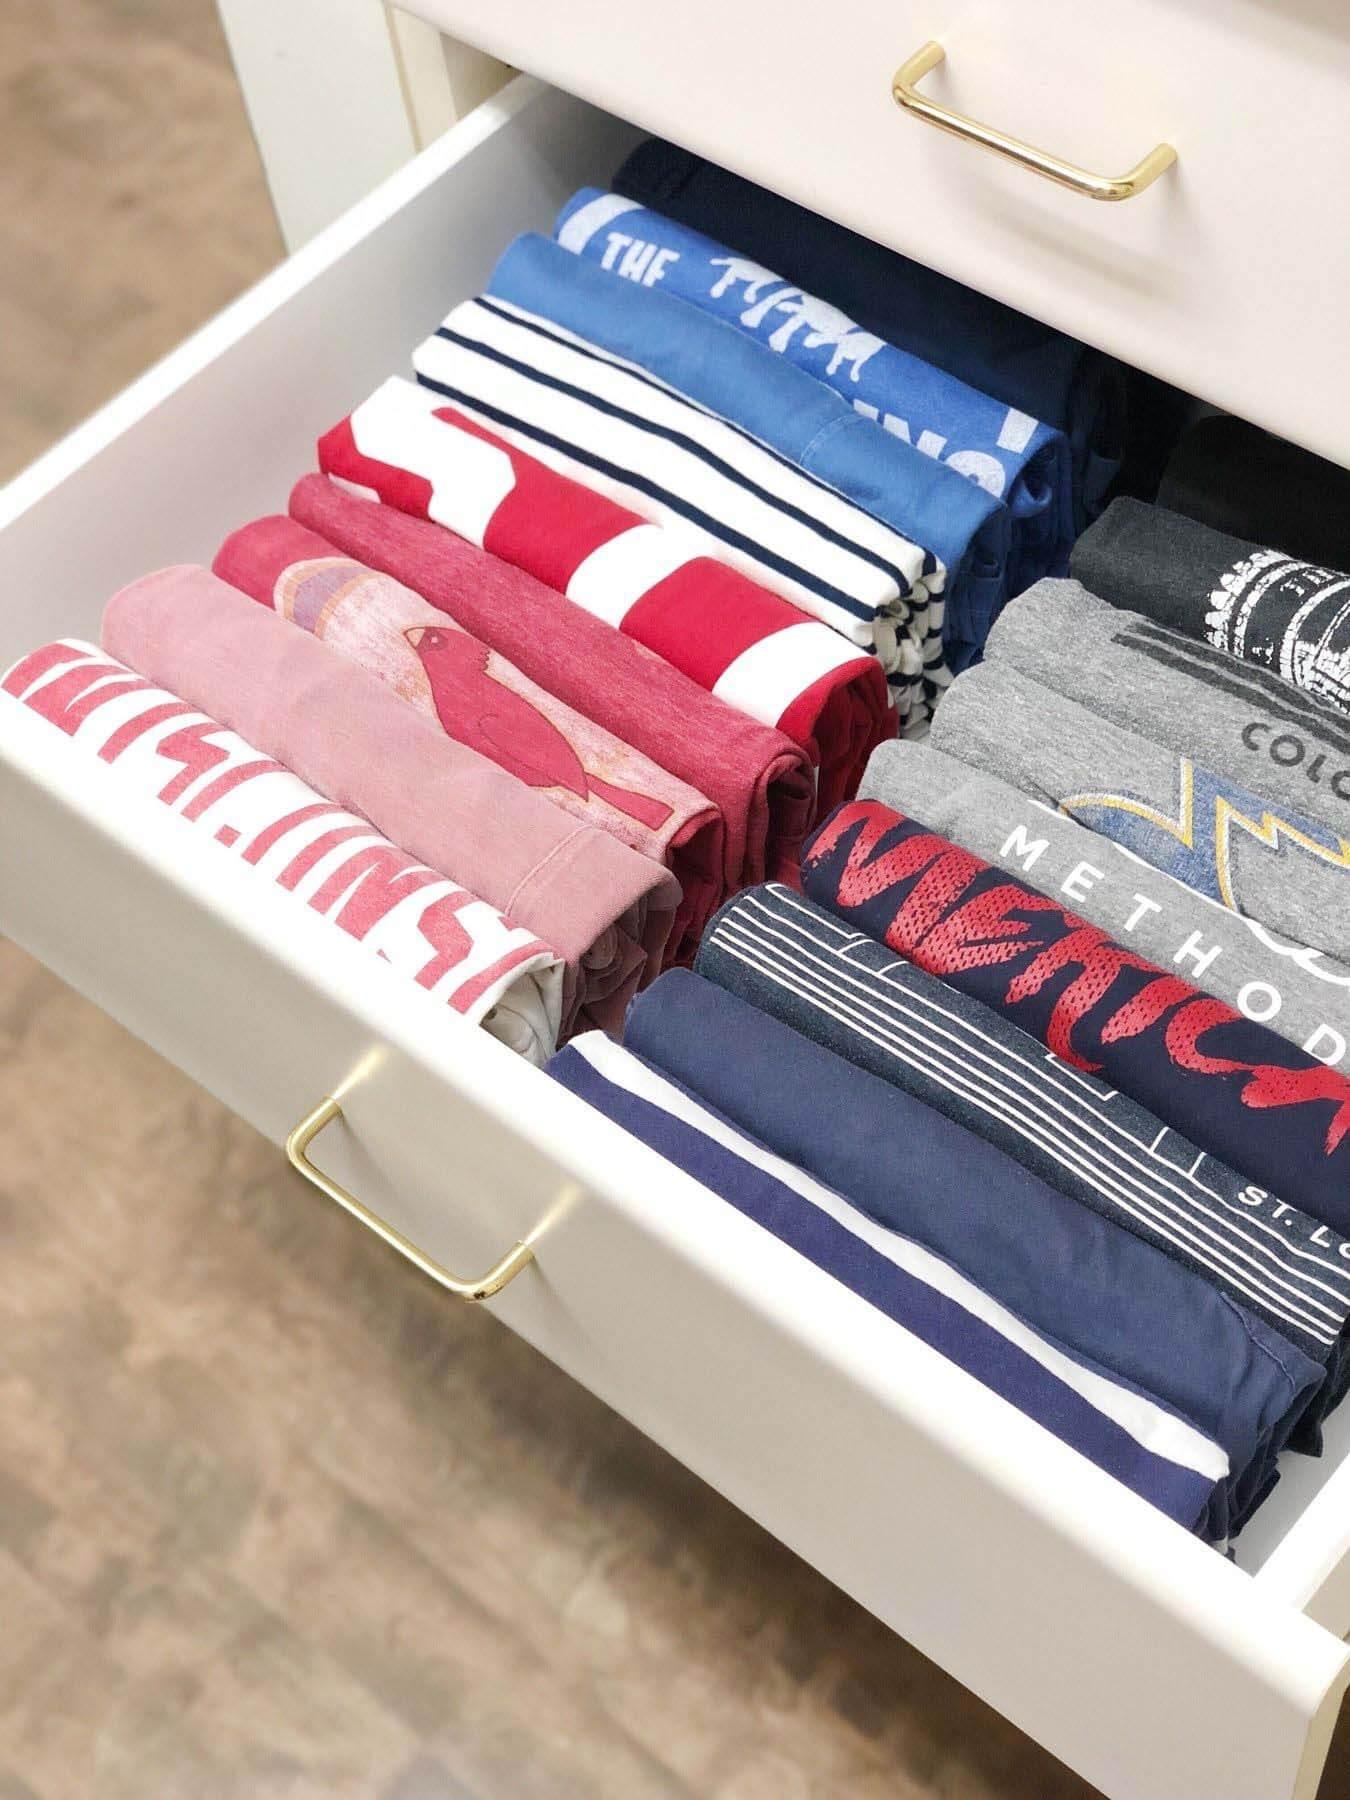 Folded t-shirts in dresser drawer